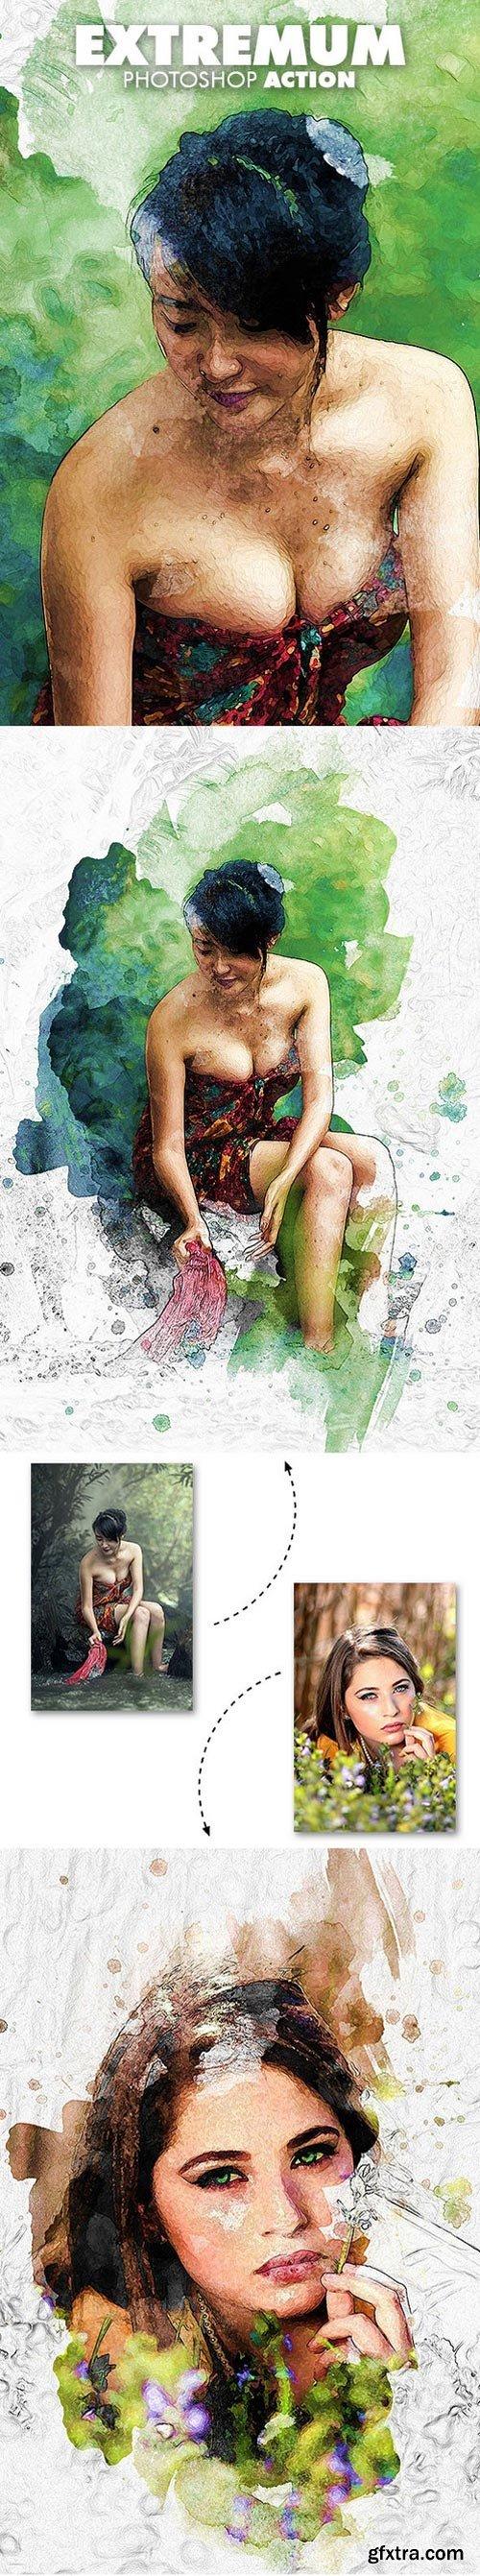 Graphicriver - Extremum Photoshop Action 19705733